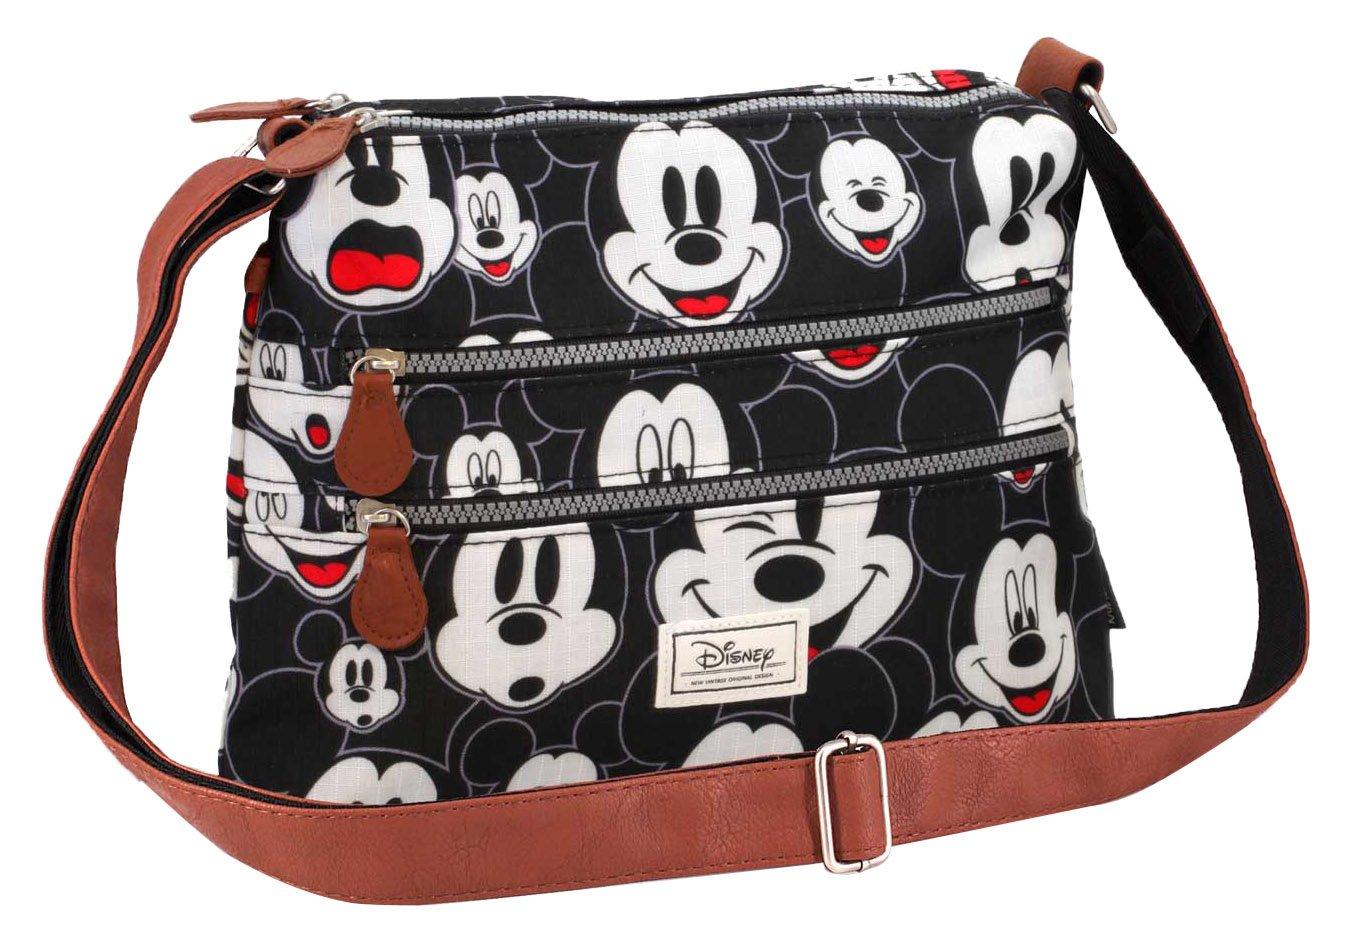 Disney Classic Mickey Visages Umhängetasche, 30 cm, Schwarz (Negro) Karactermania 36480